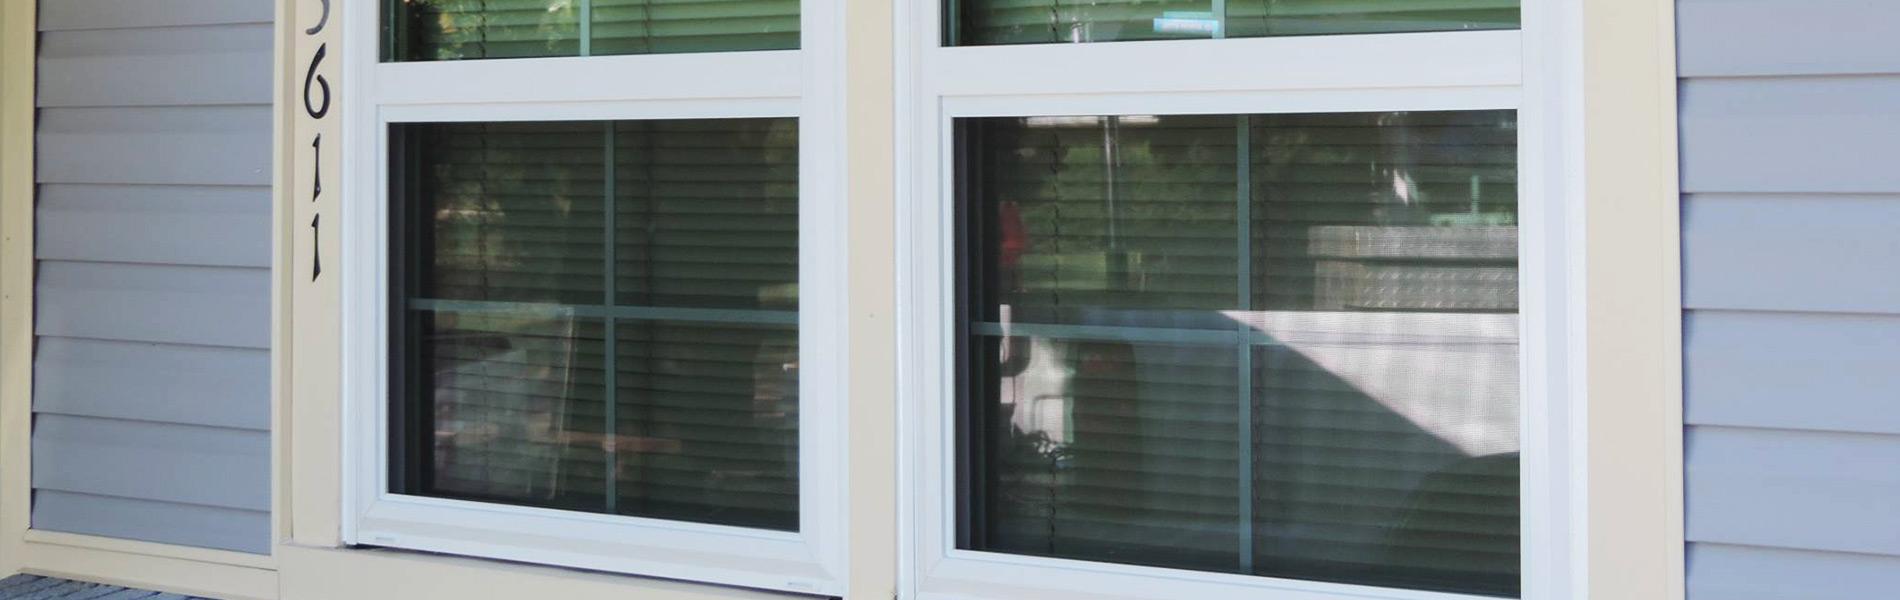 Double Paned Aluminum Storm Windows Shreveport La